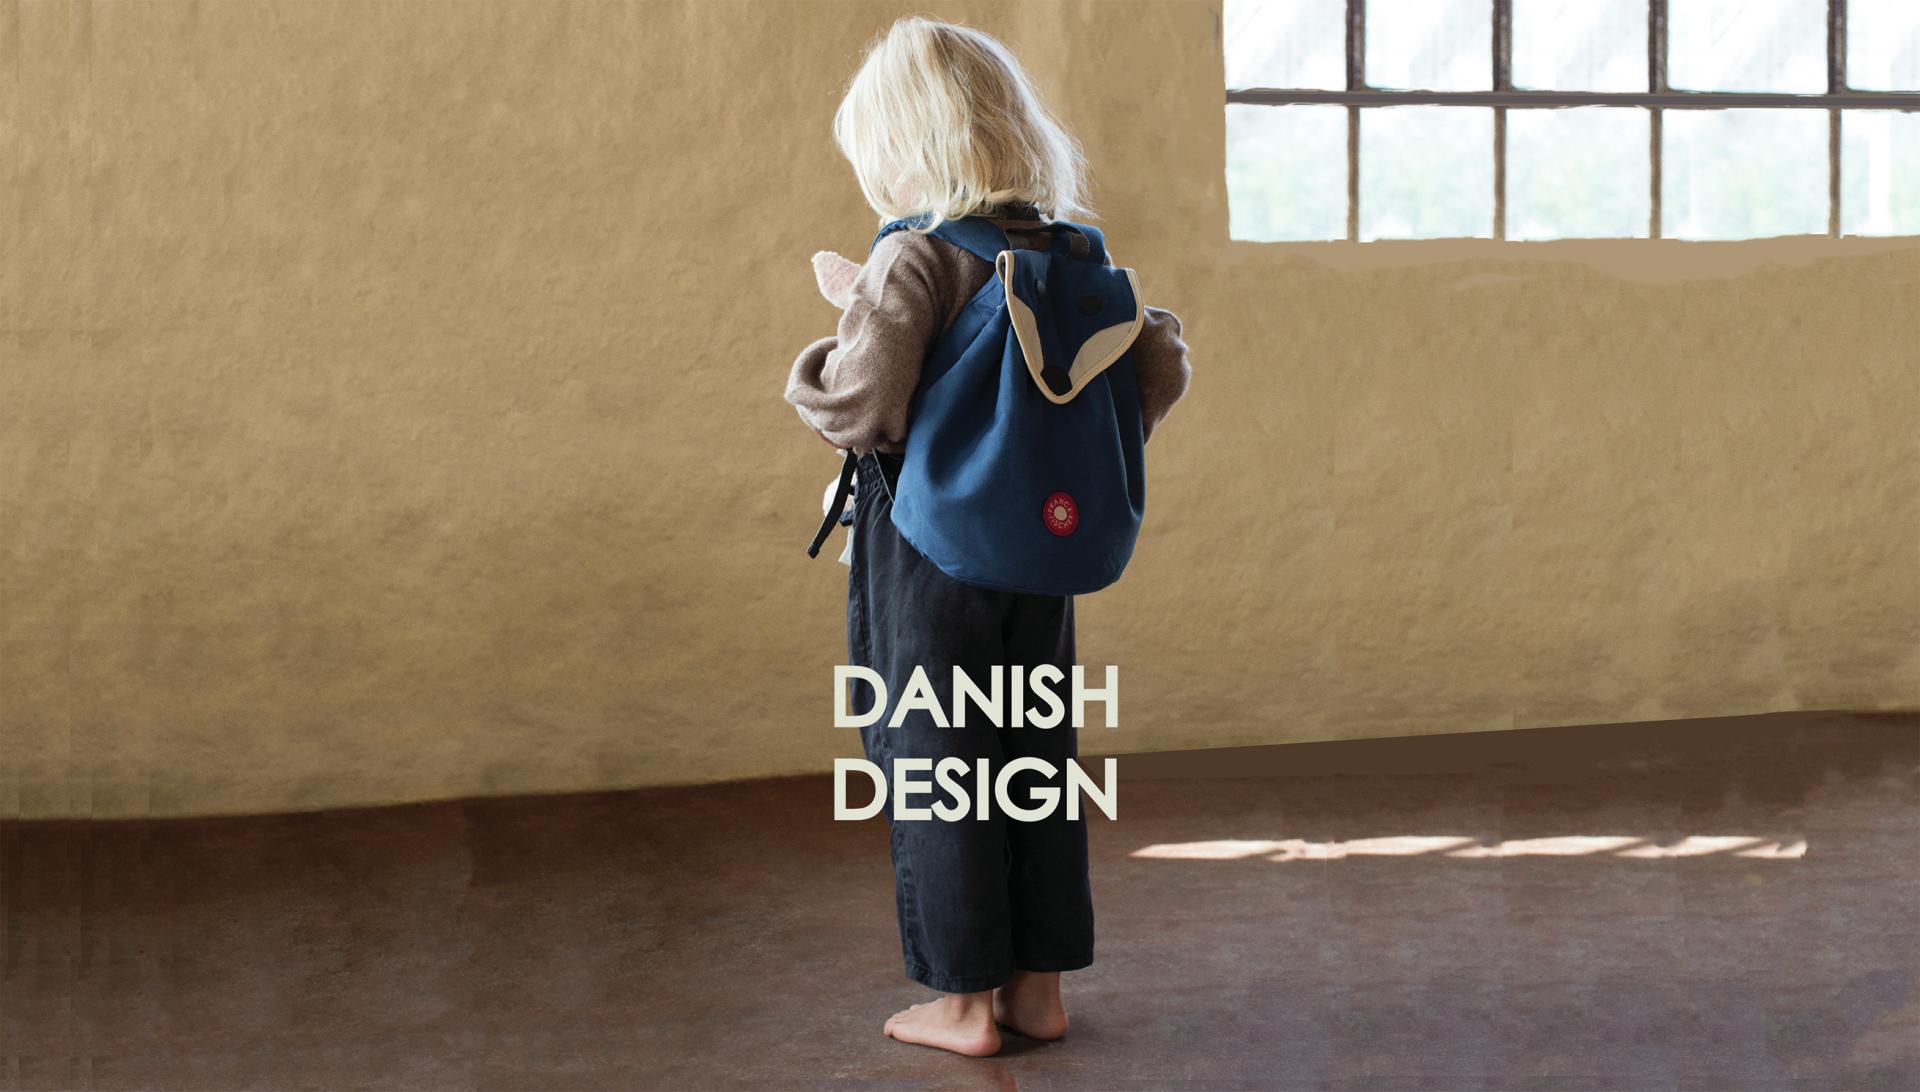 3-DANISH-DESIGN-with-girl